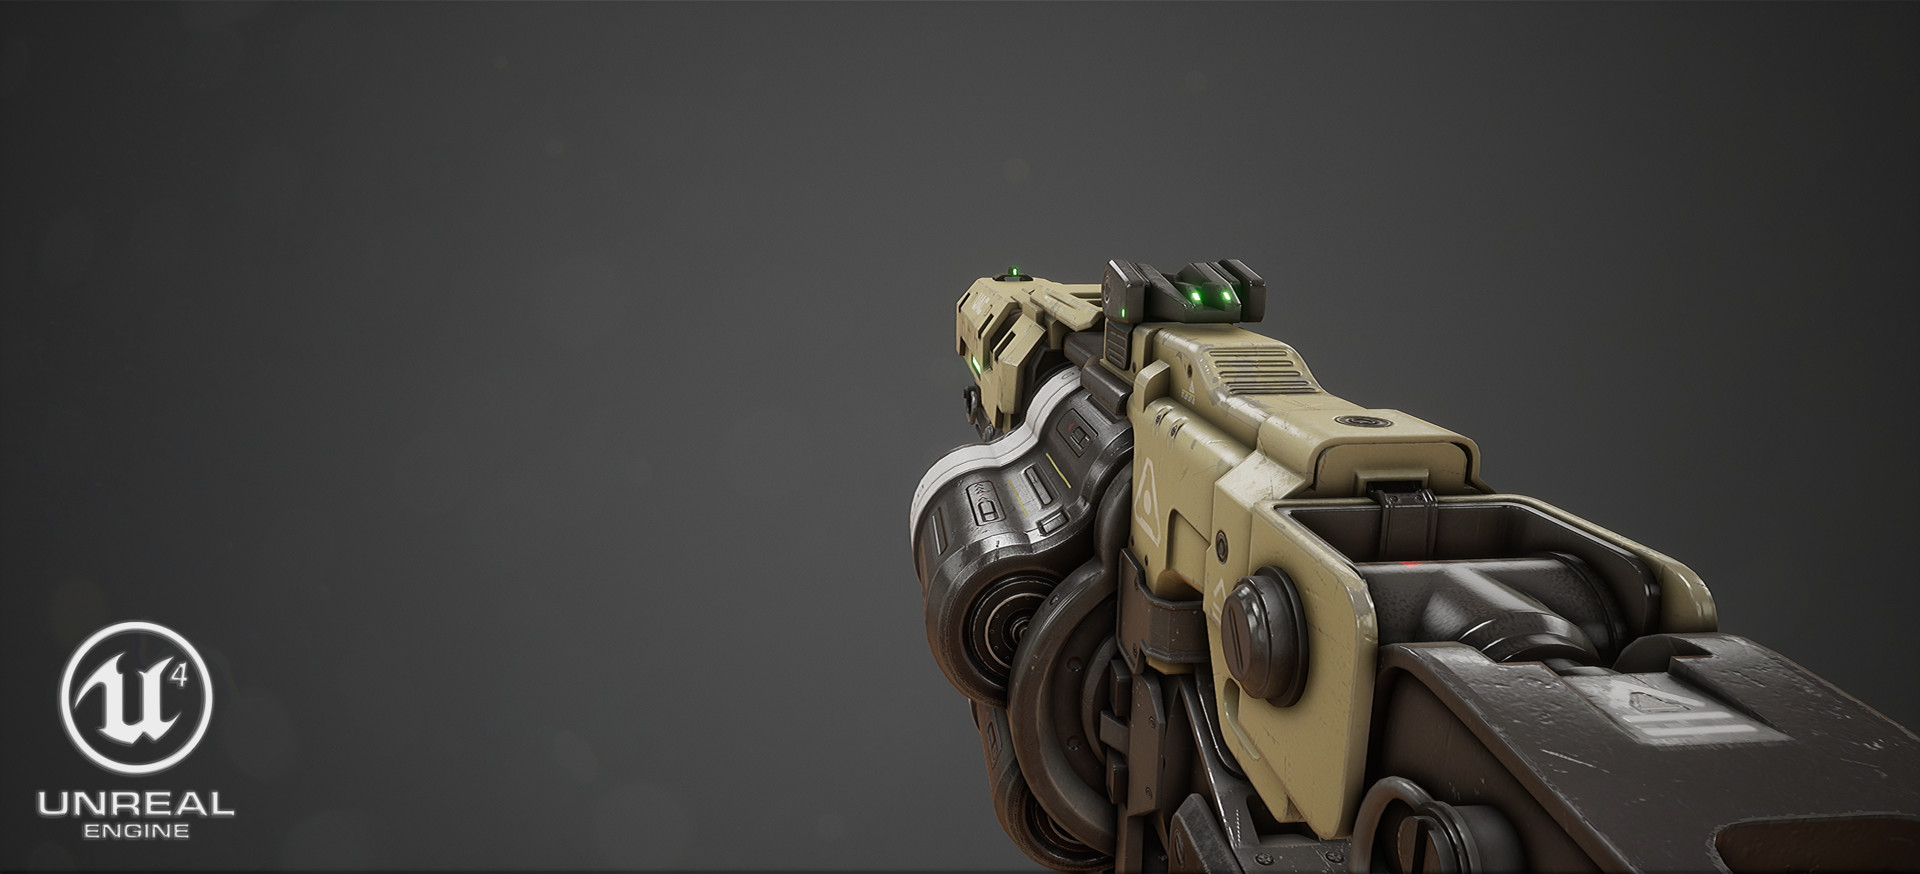 ArtStation - Doom 4: Grenade Launcher | Game Ready Hard